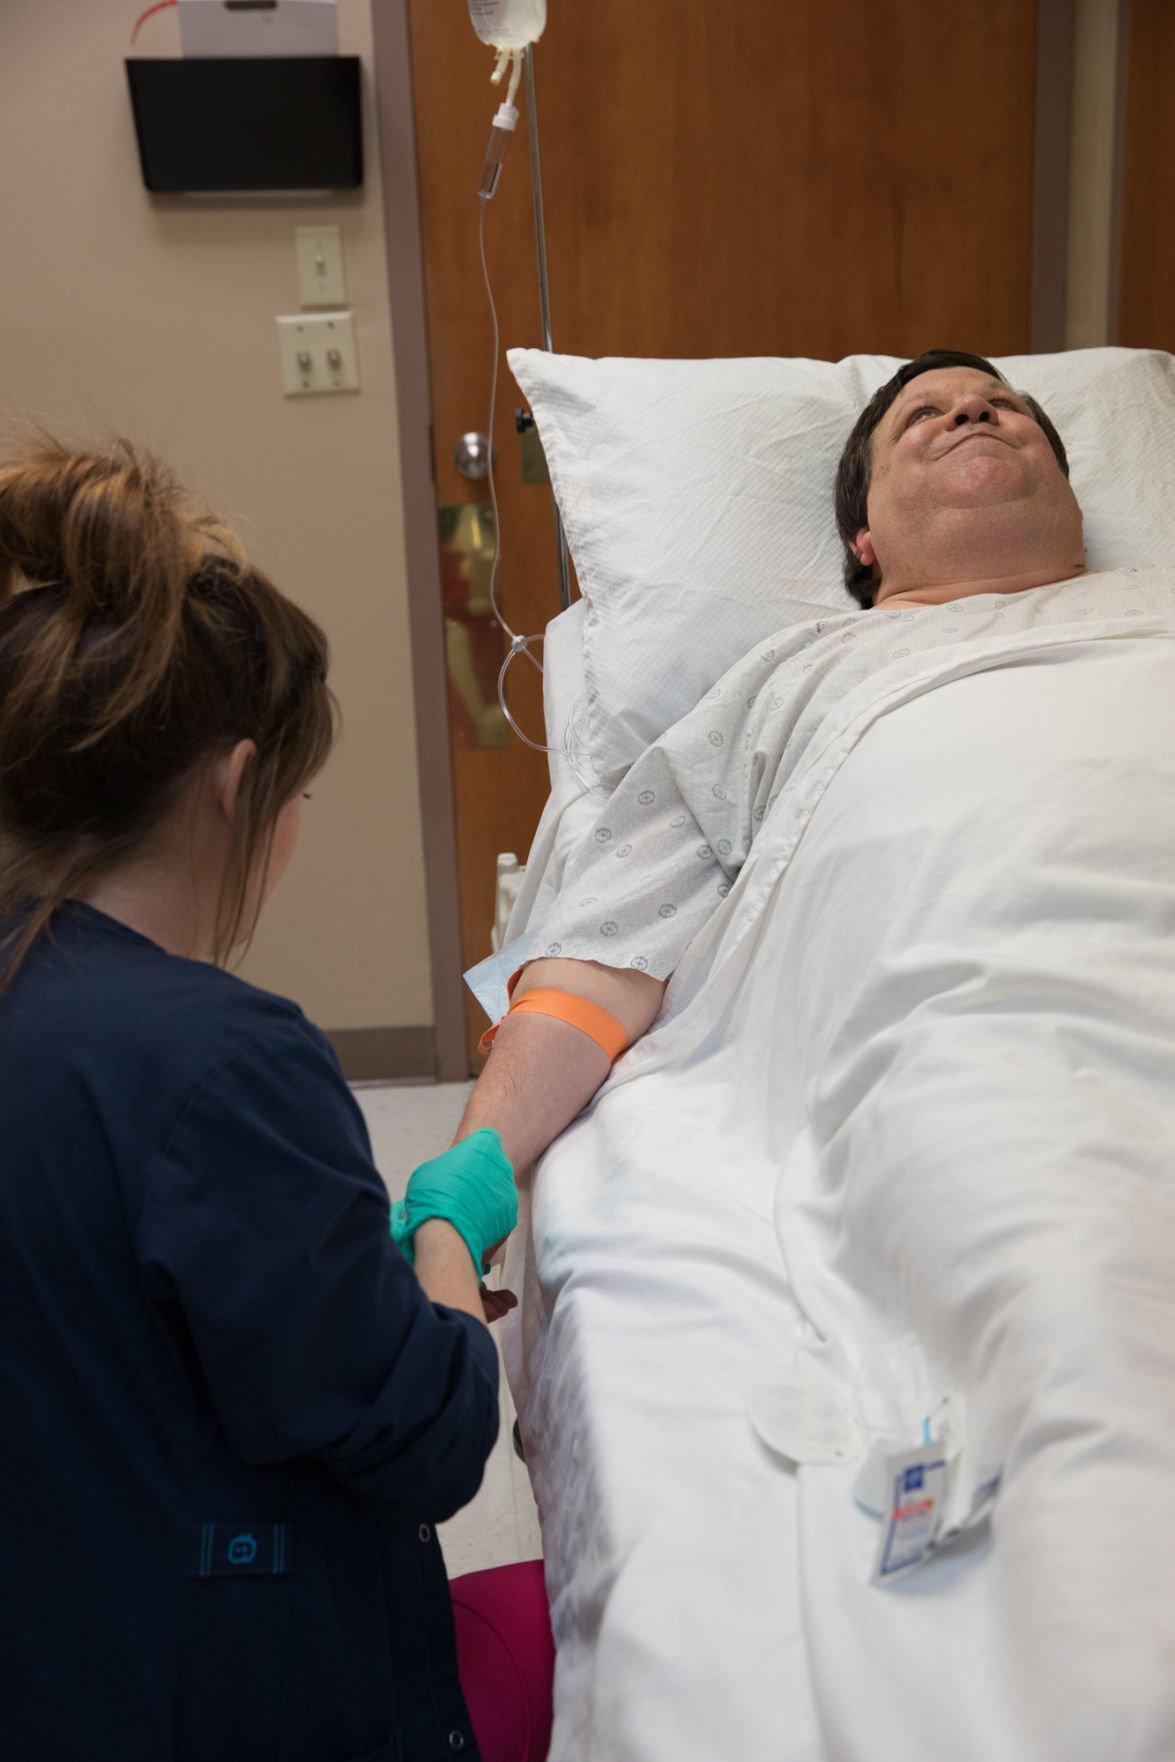 Colonoscopy Room: Colonoscopy Screening Helps Save Lives